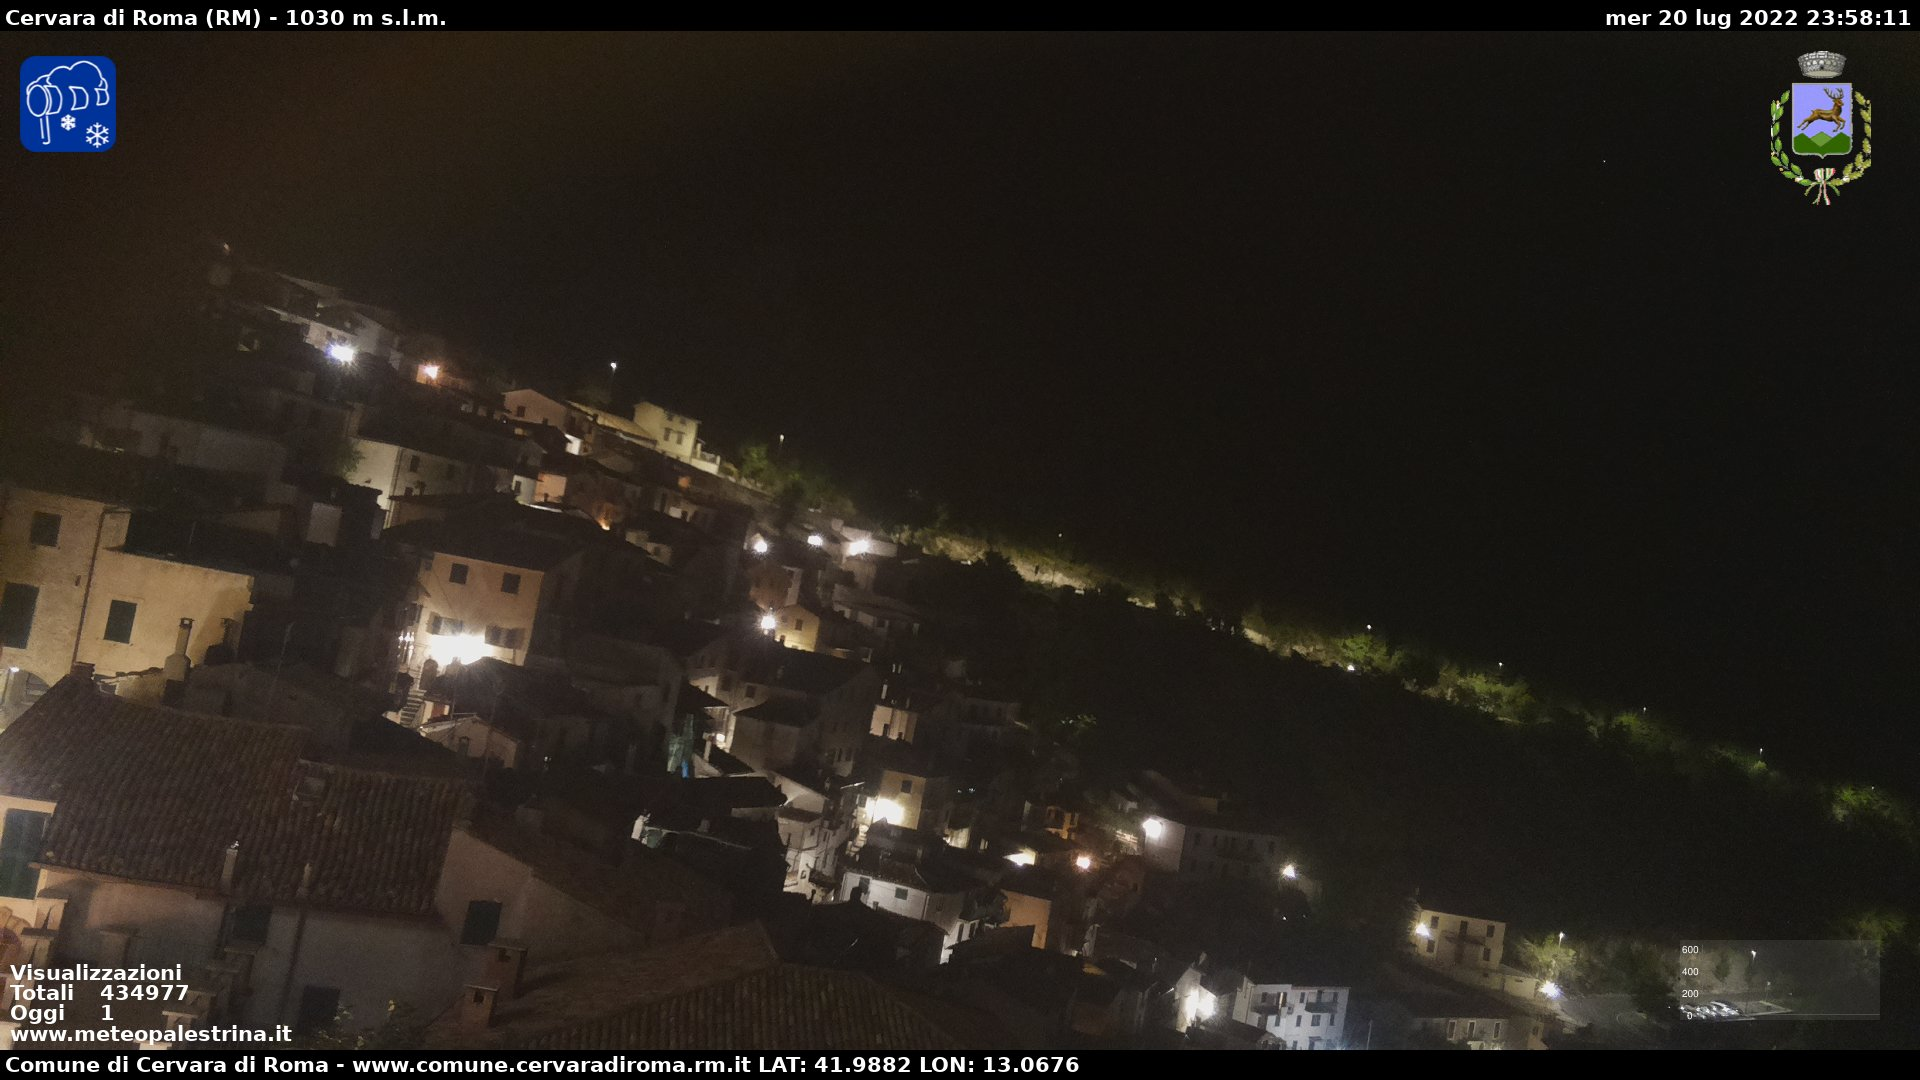 Webcam Cervara di Roma